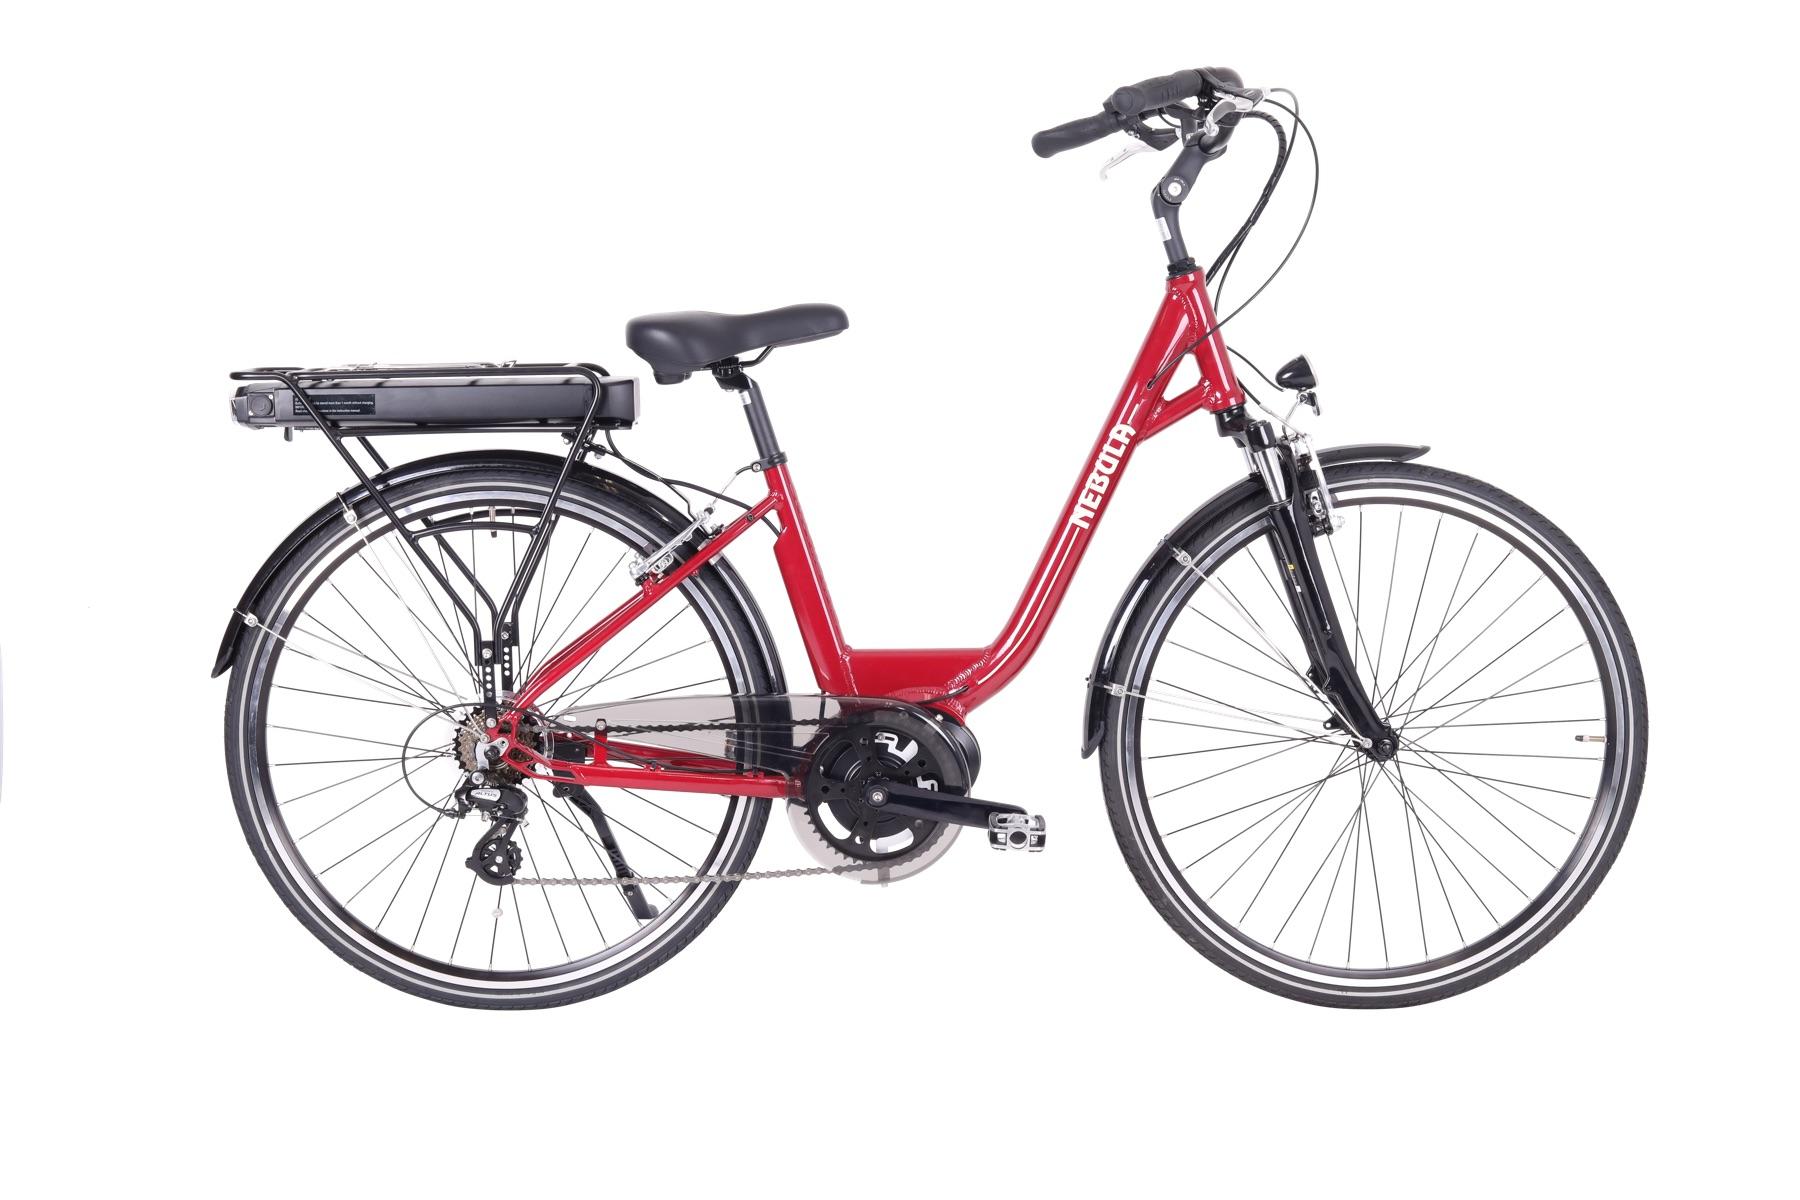 Nebula Mid Motor E Bike For Confident Riding